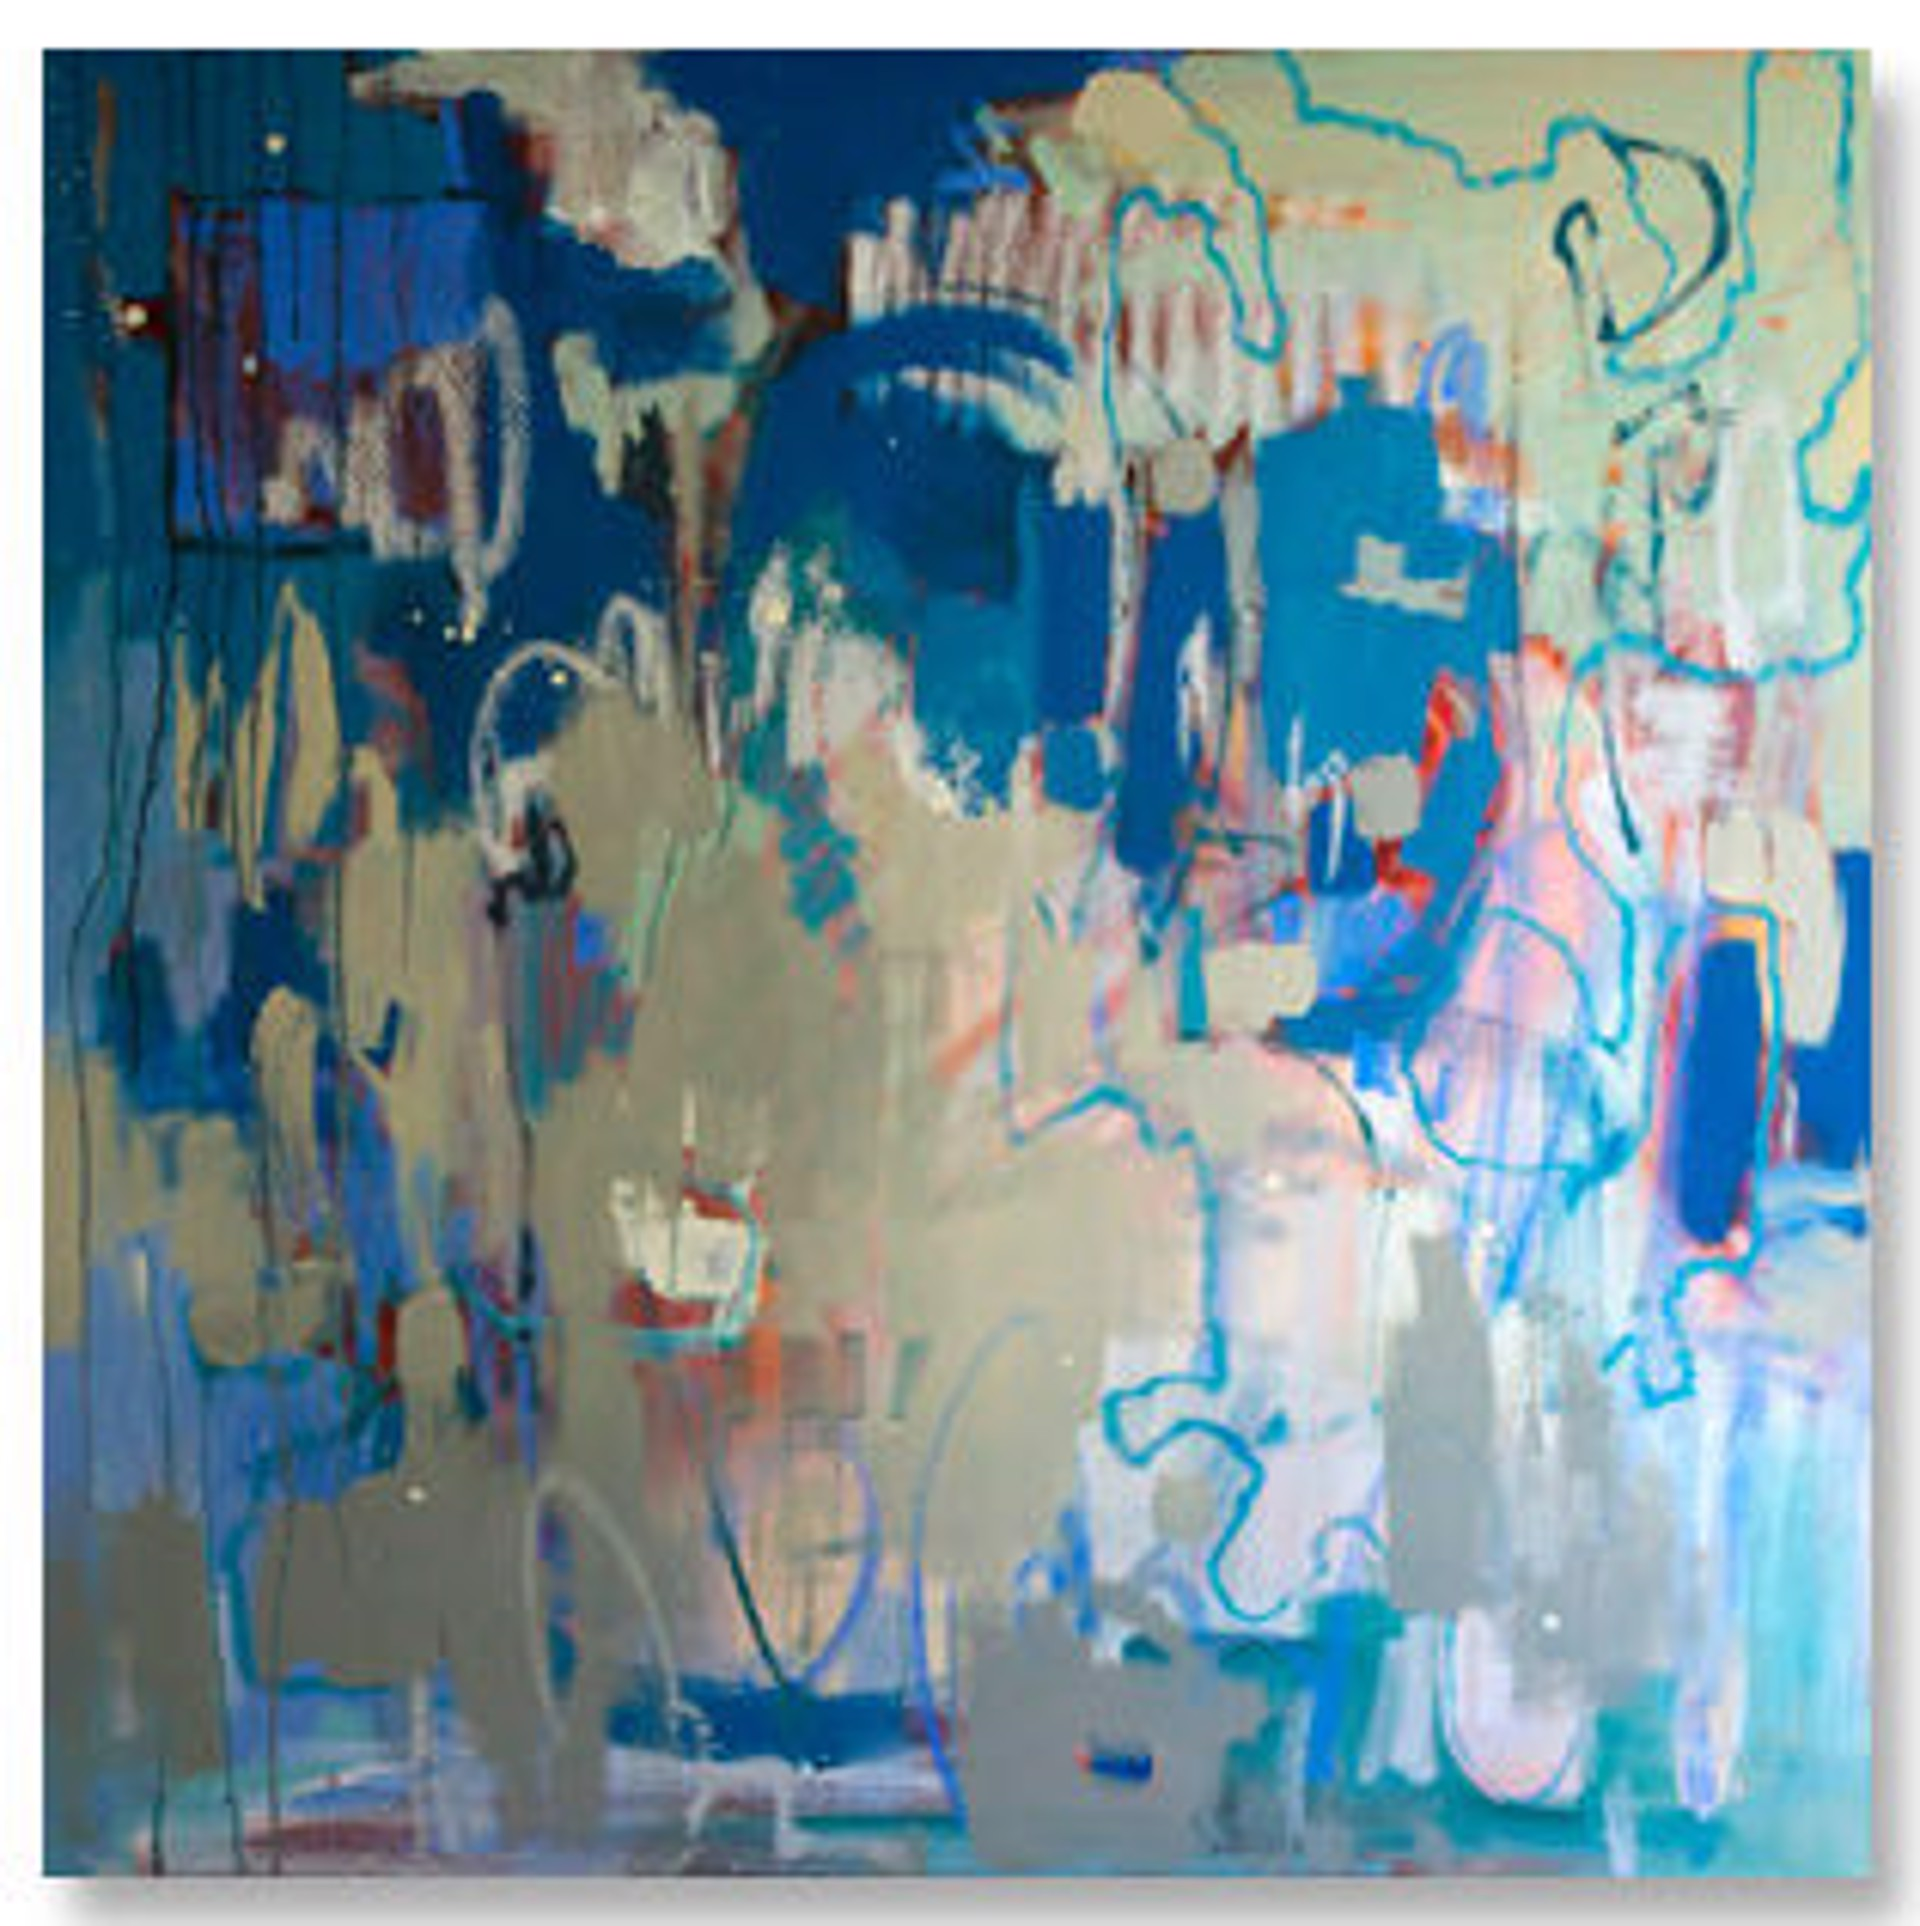 Blues by Samantha Buller